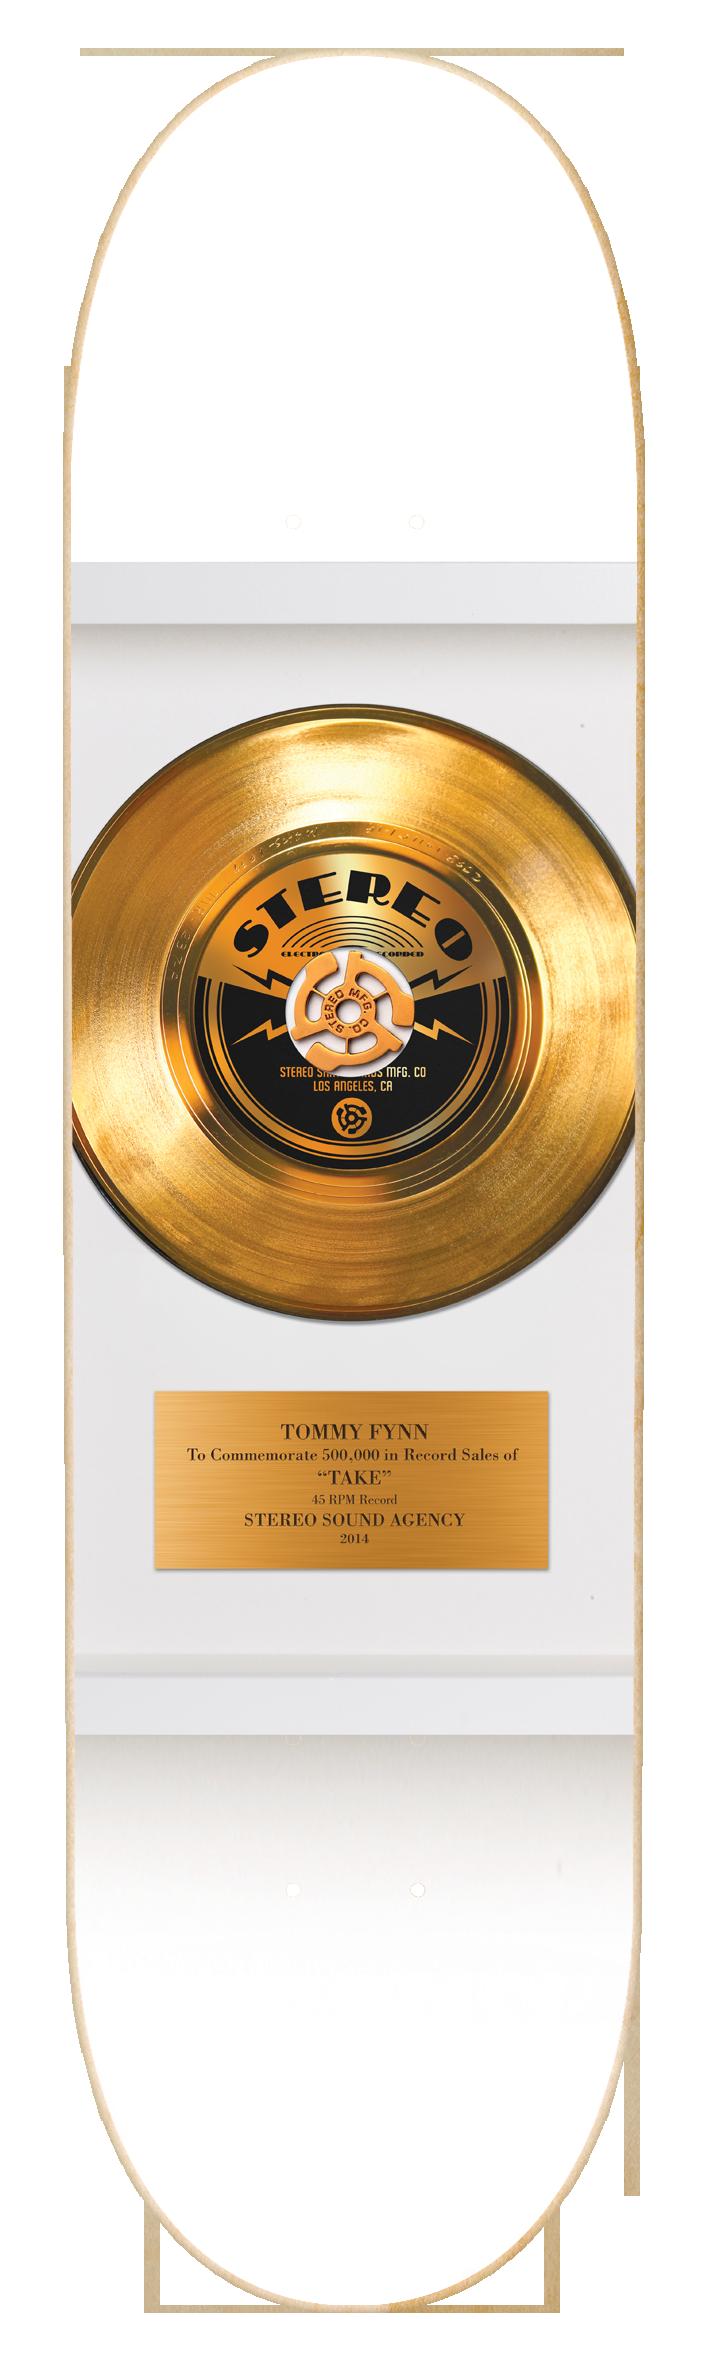 fynn-gold-record-mockup.png